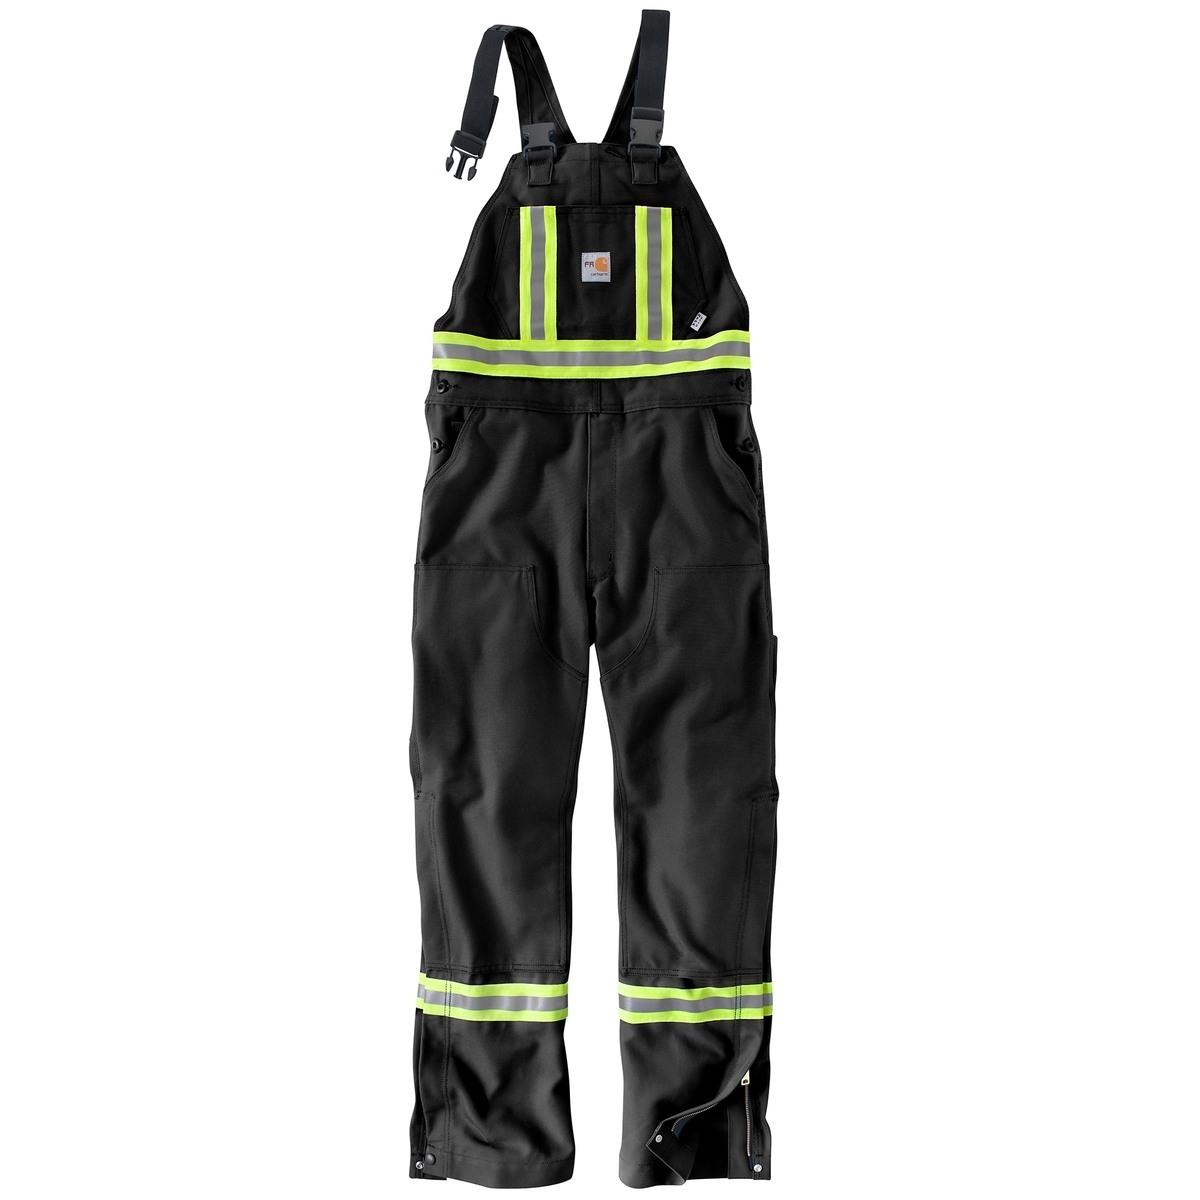 Carhartt - Mens Flame-Resistant Striped Duck Bib Overall-Carhartt